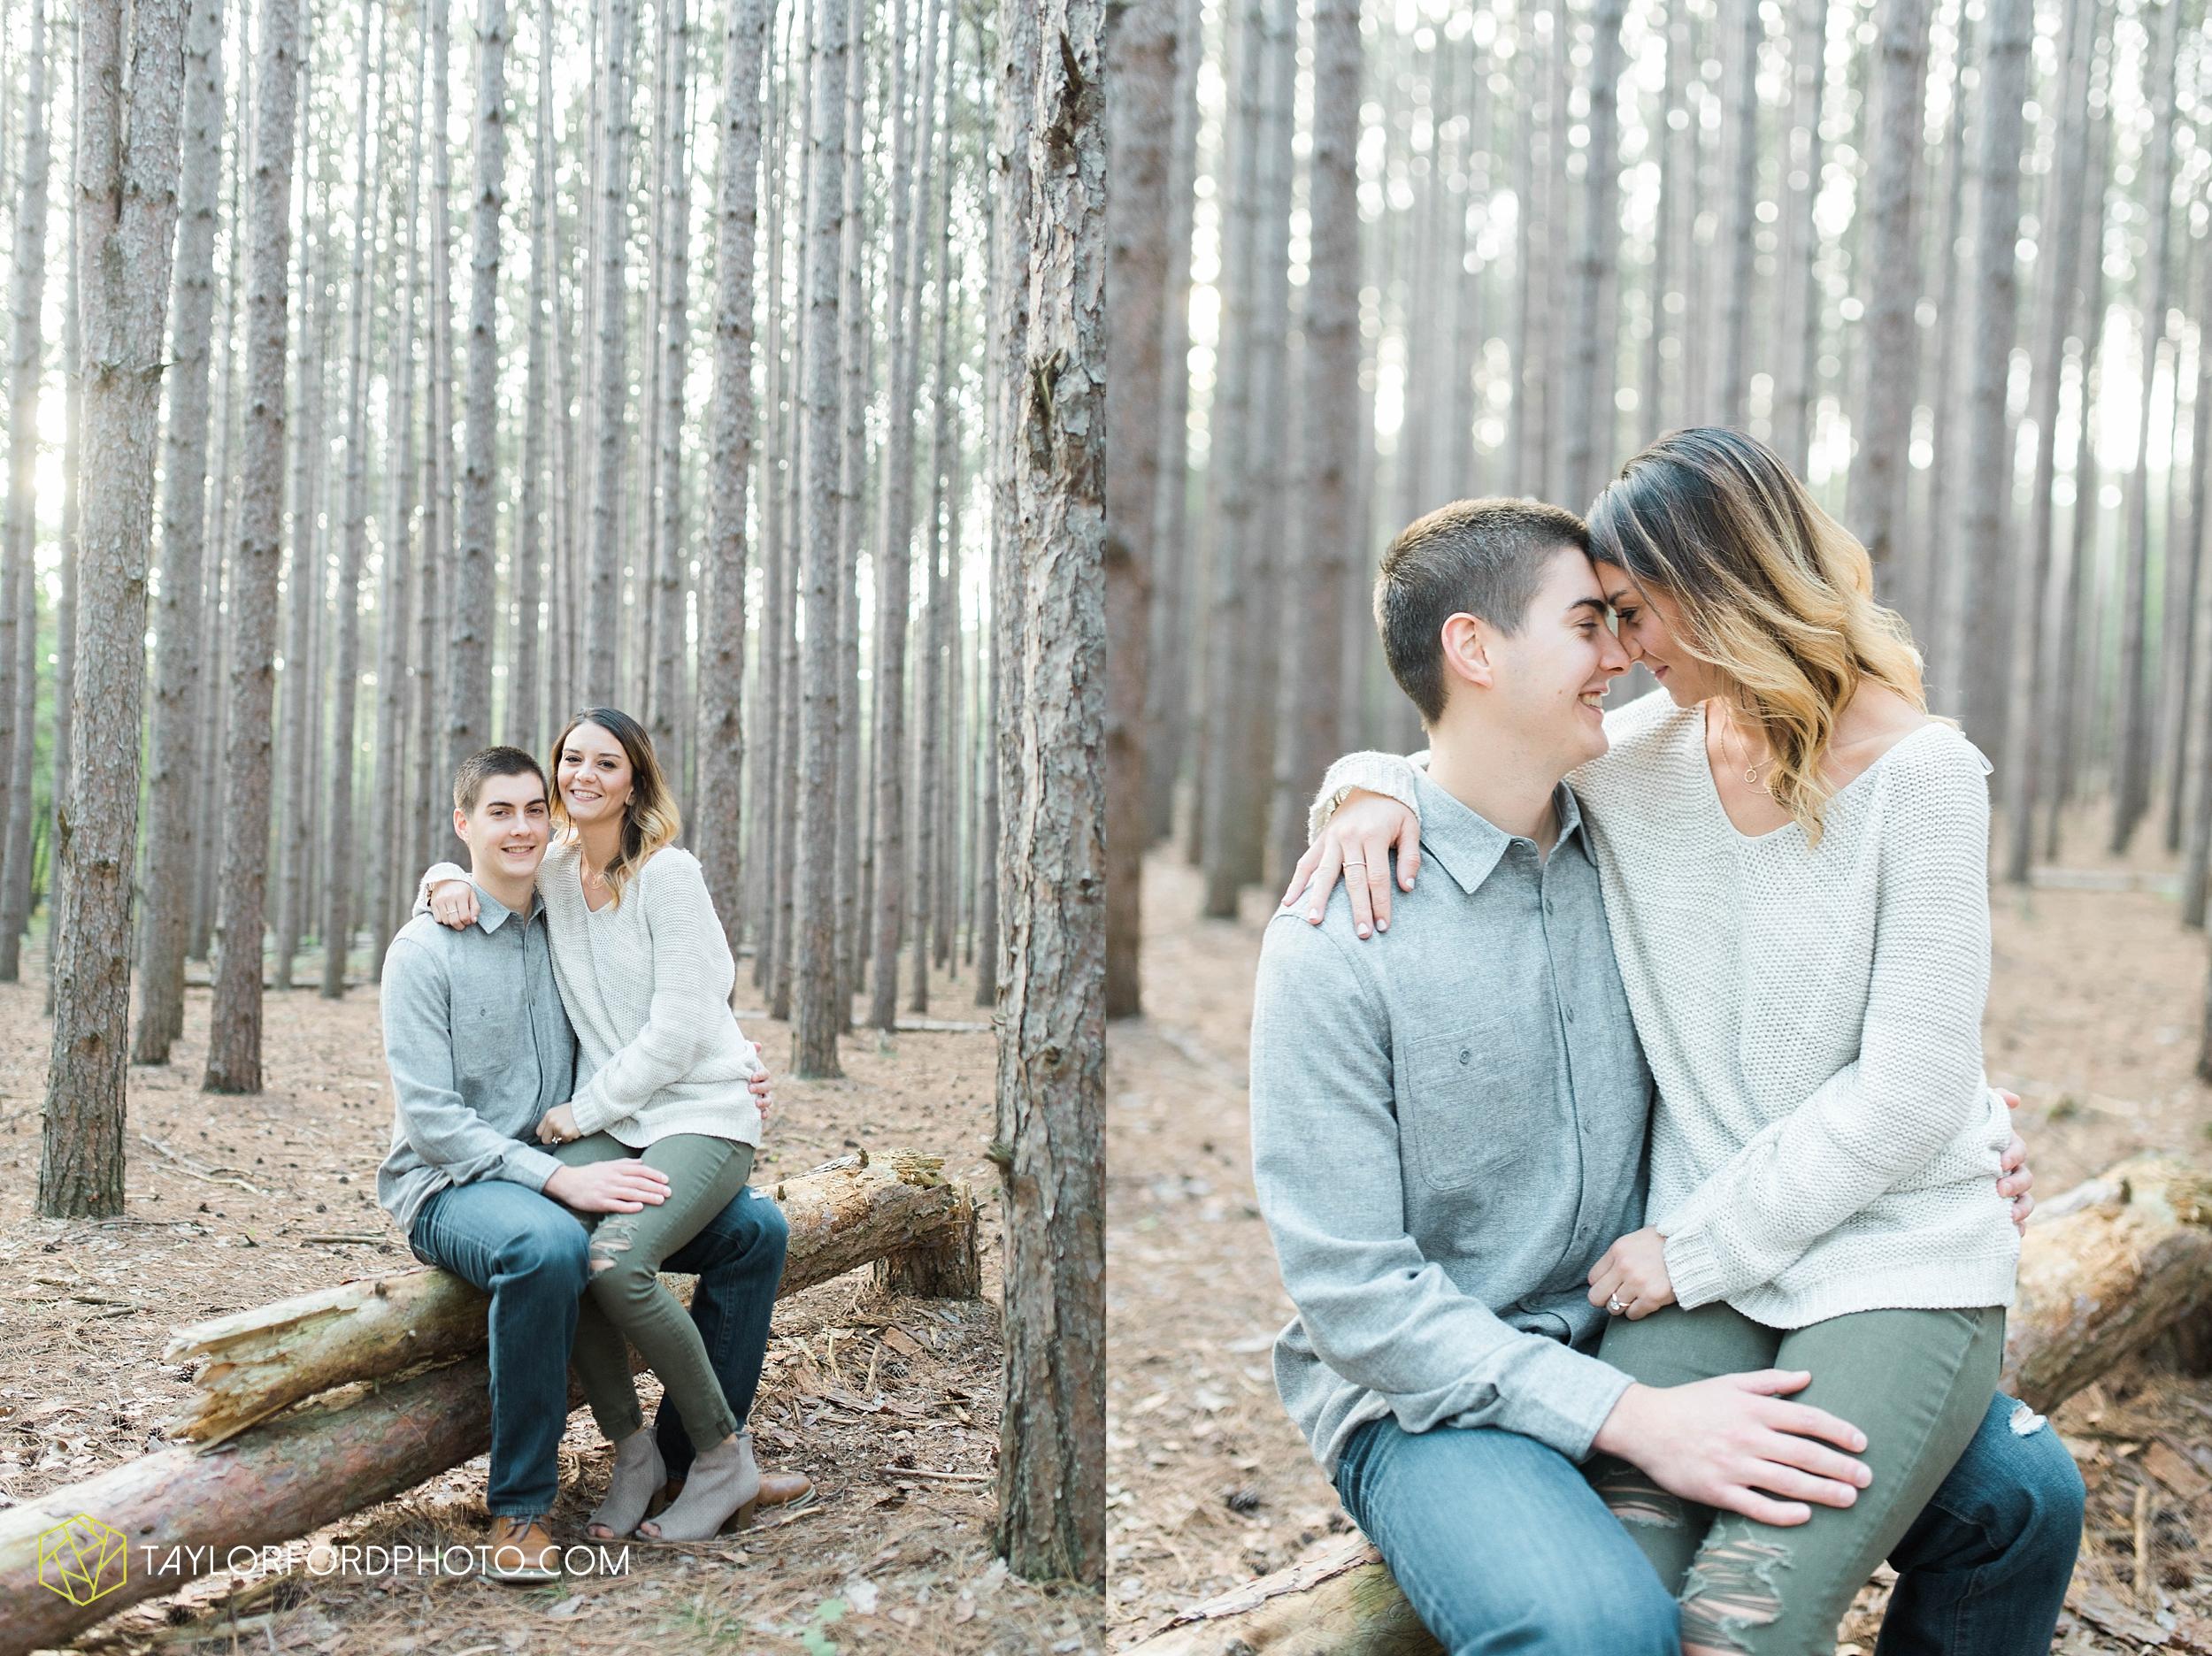 toledo-ohio-engagement-wedding-photographer-Taylor-Ford-Photography-oaks-openings-toledo-metro_3677.jpg